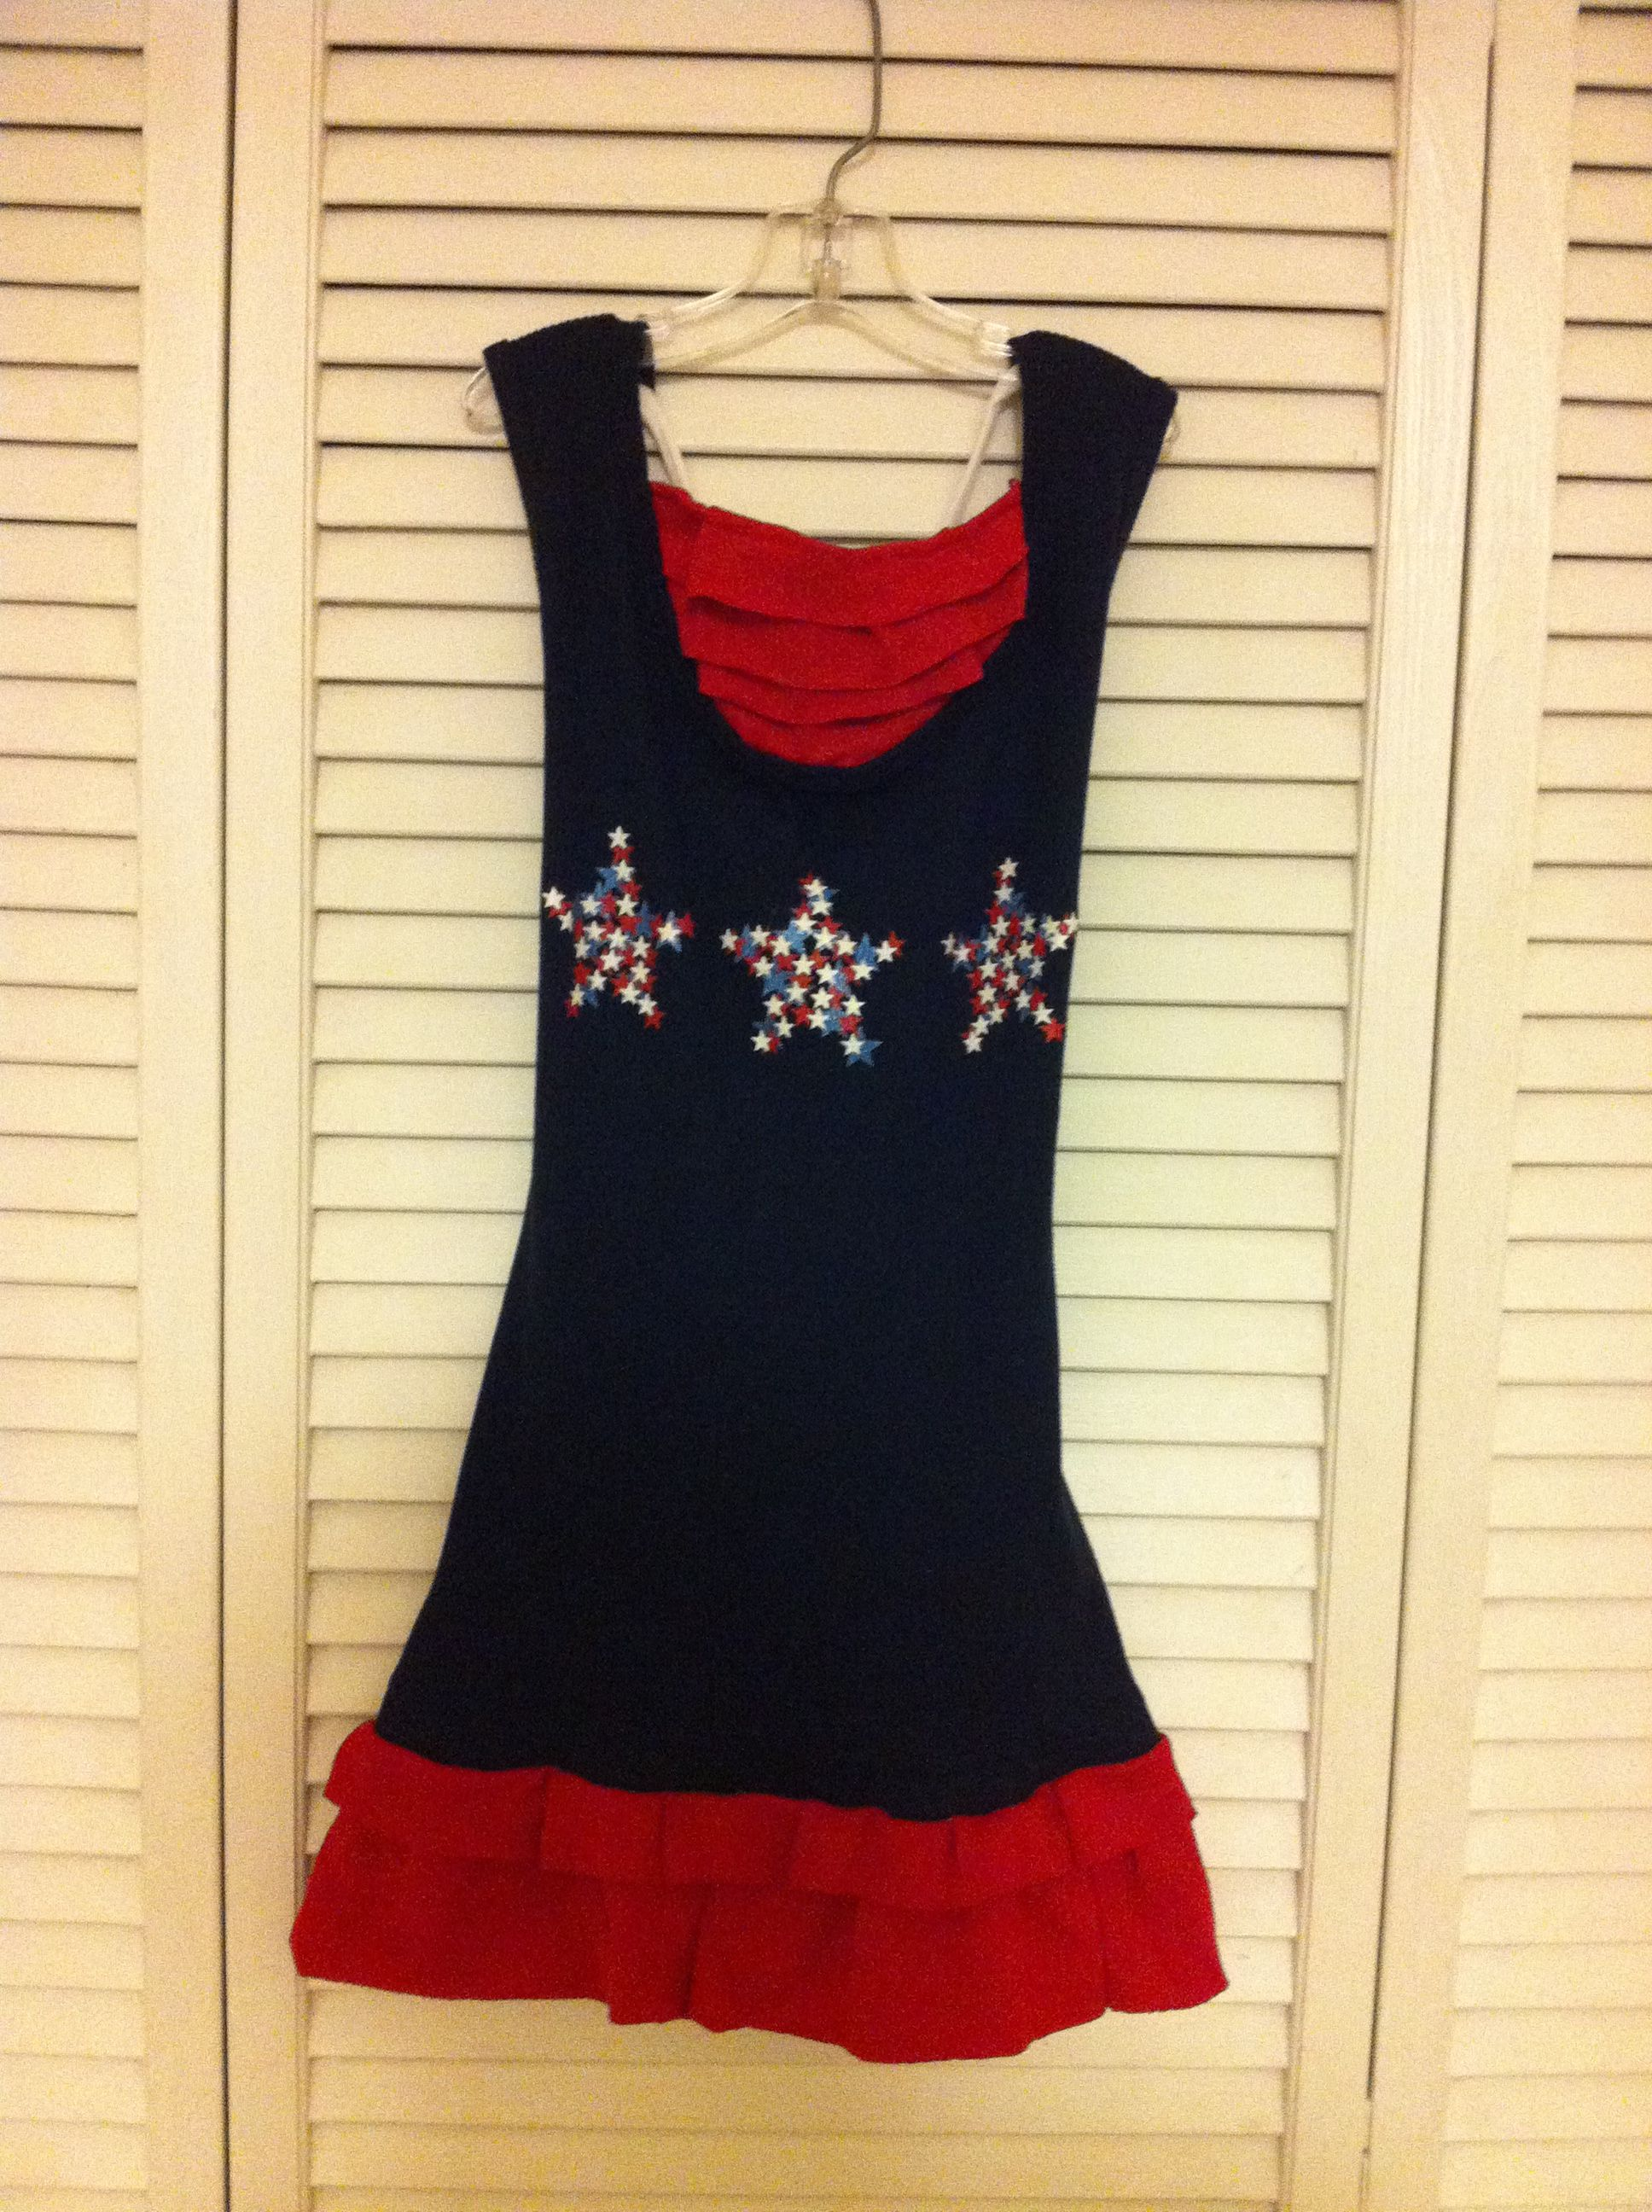 how to make a tank top dress